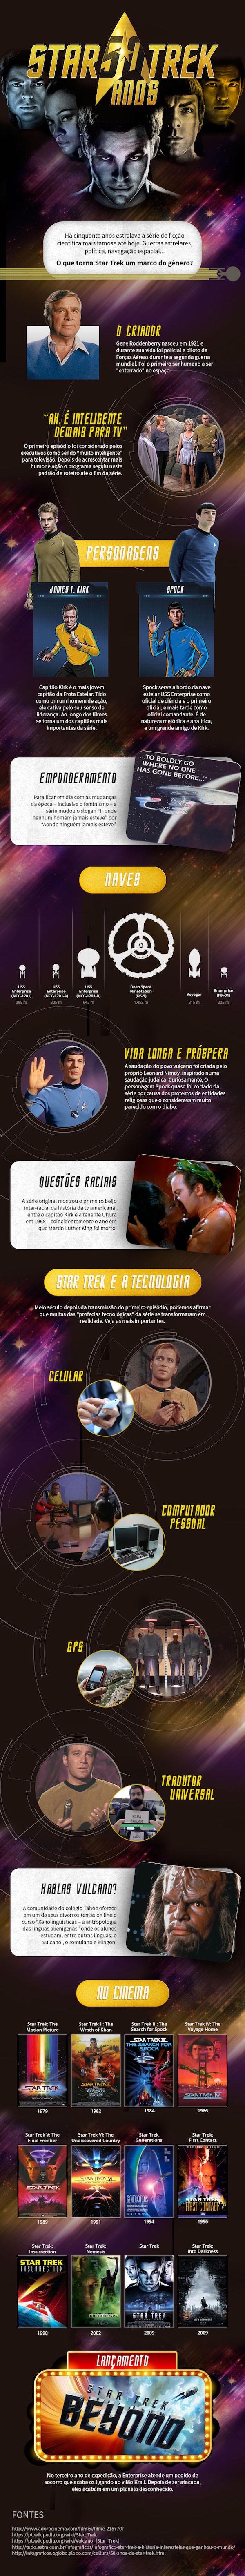 50 anos Star Trek - curiosidades